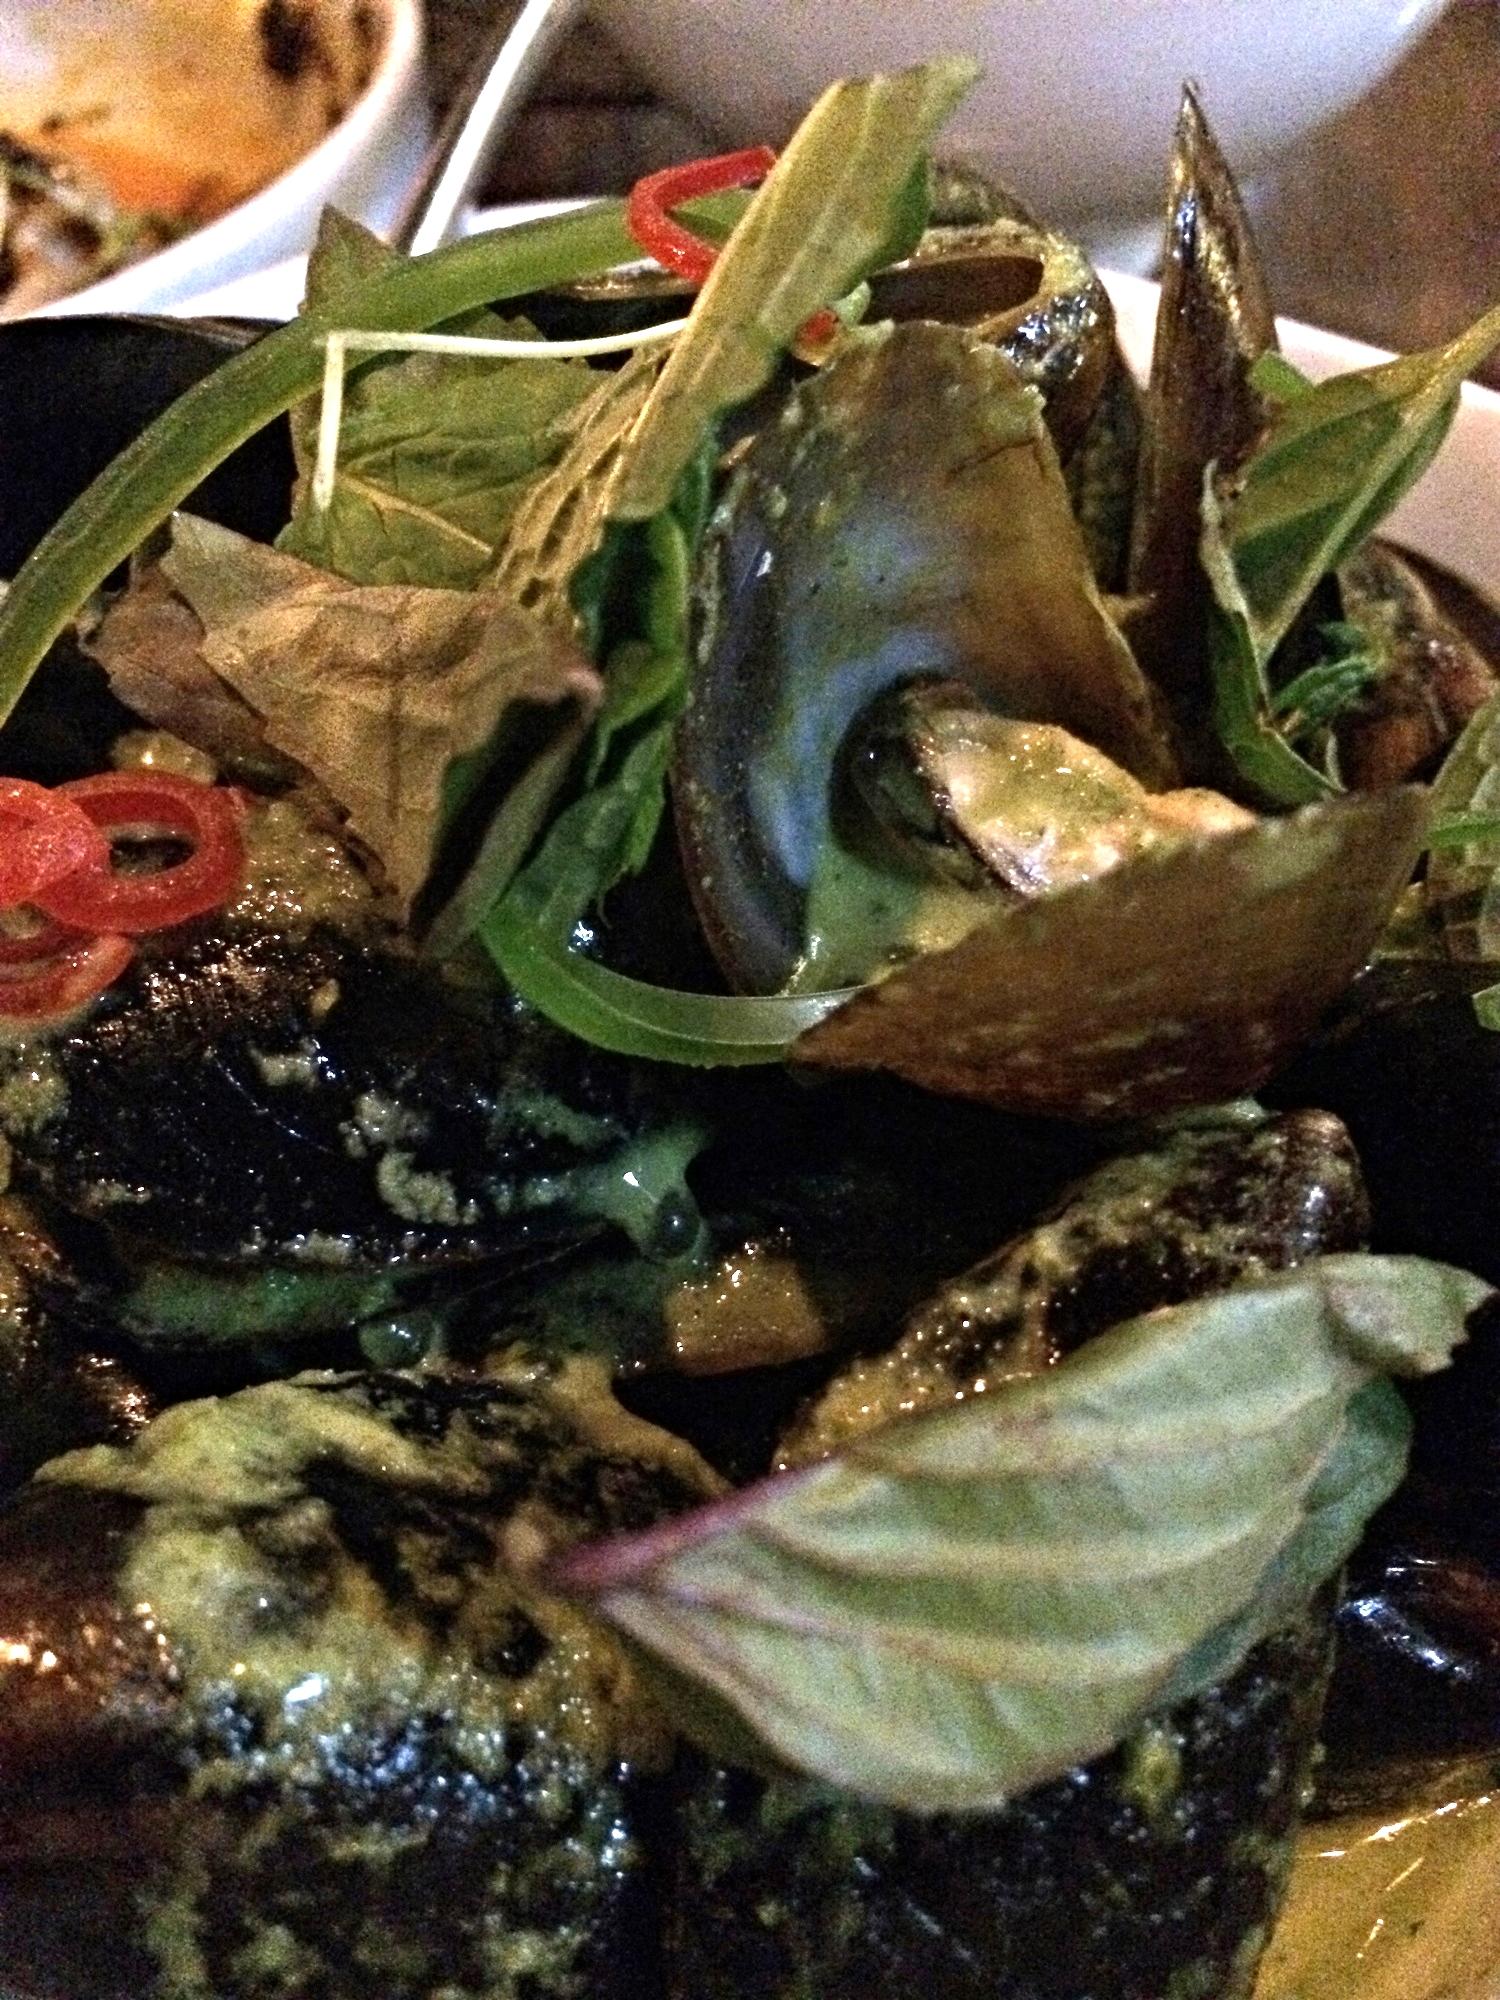 Prince Edward Island mussels (yay, Canada!), jalapeño, kaffir lime, lemograss, coconut, tapioca